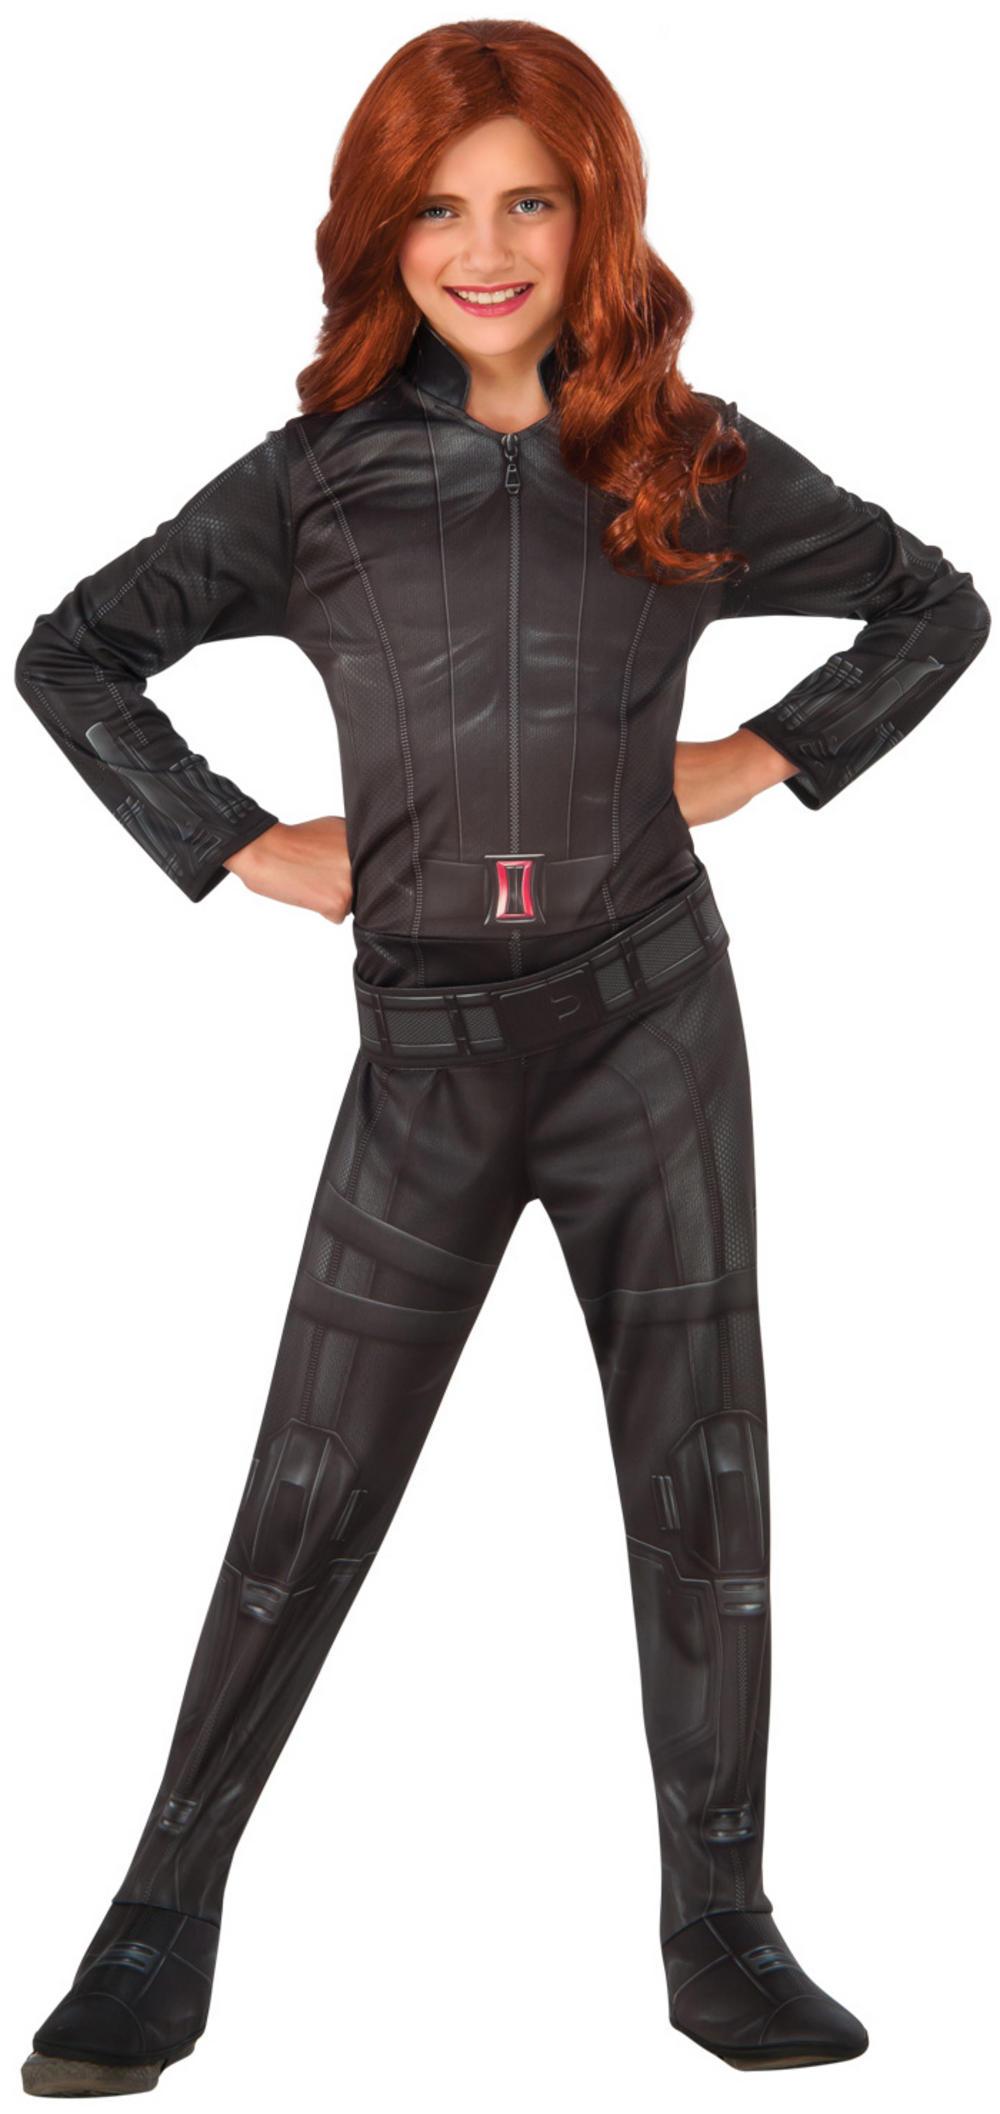 Black Widow Civil War Girls Costume